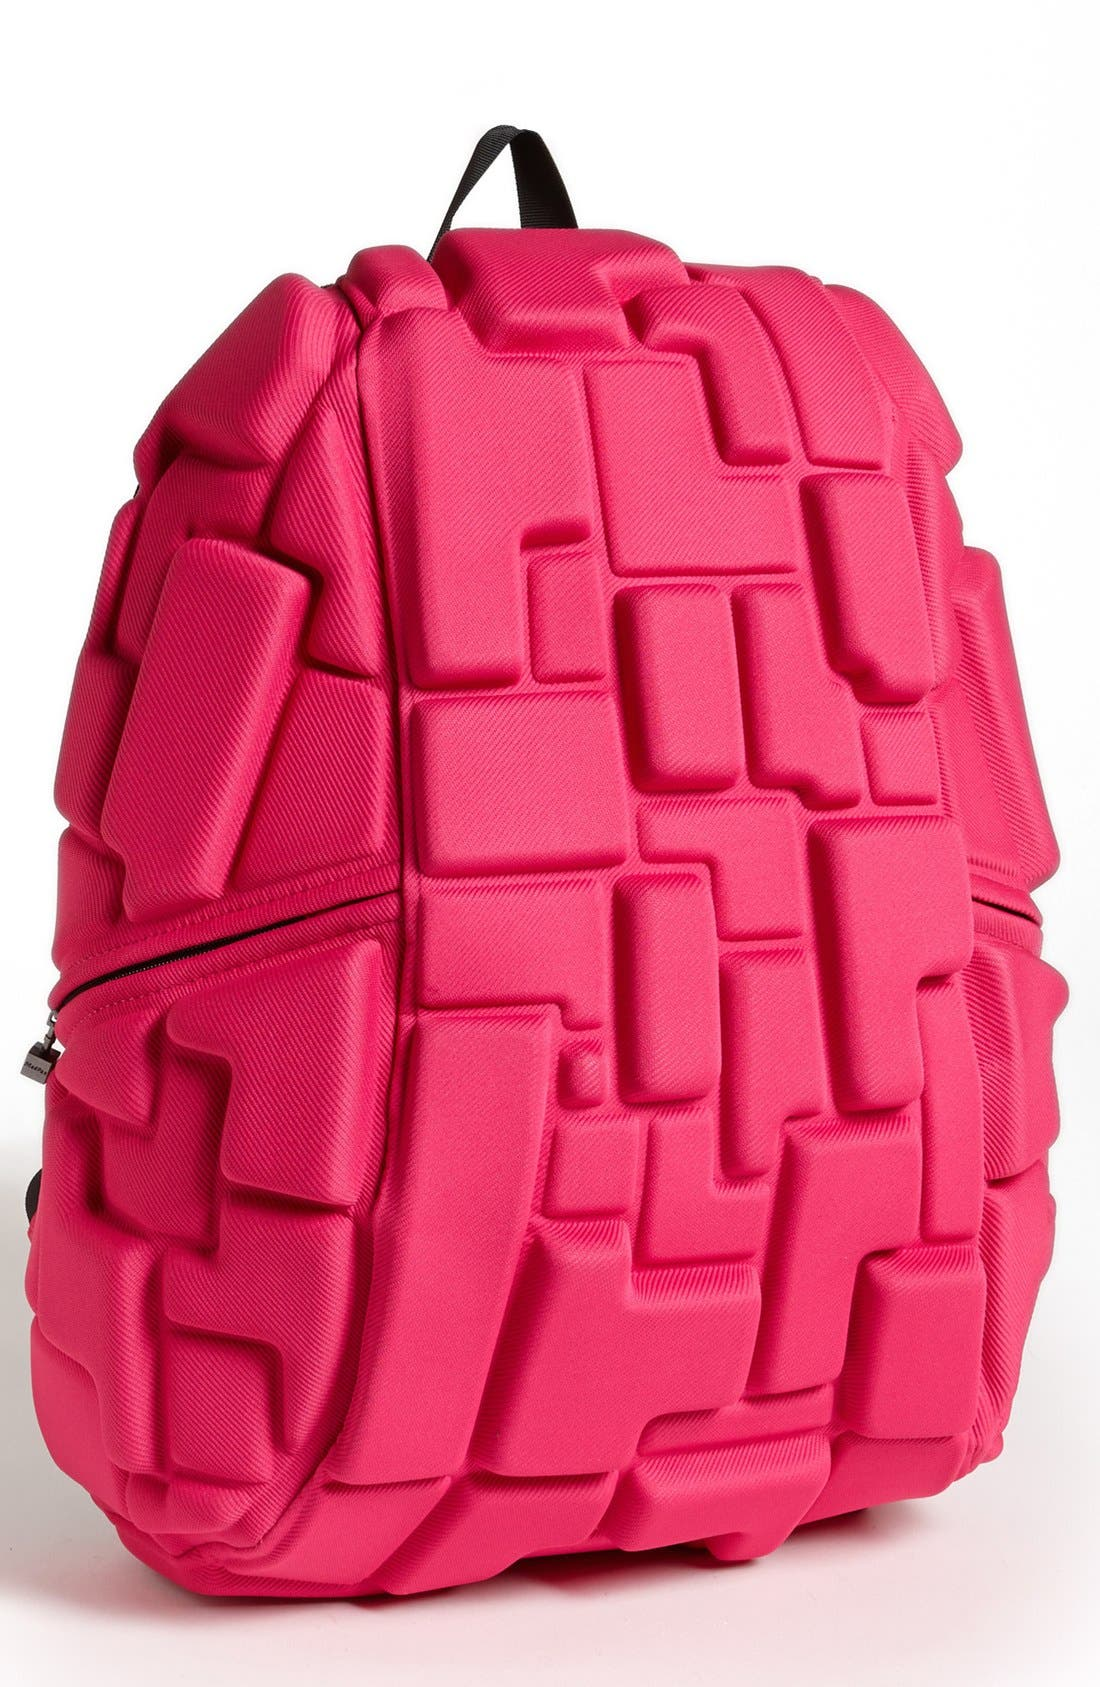 Main Image - MadPax 'Blok' Backpack (Girls)